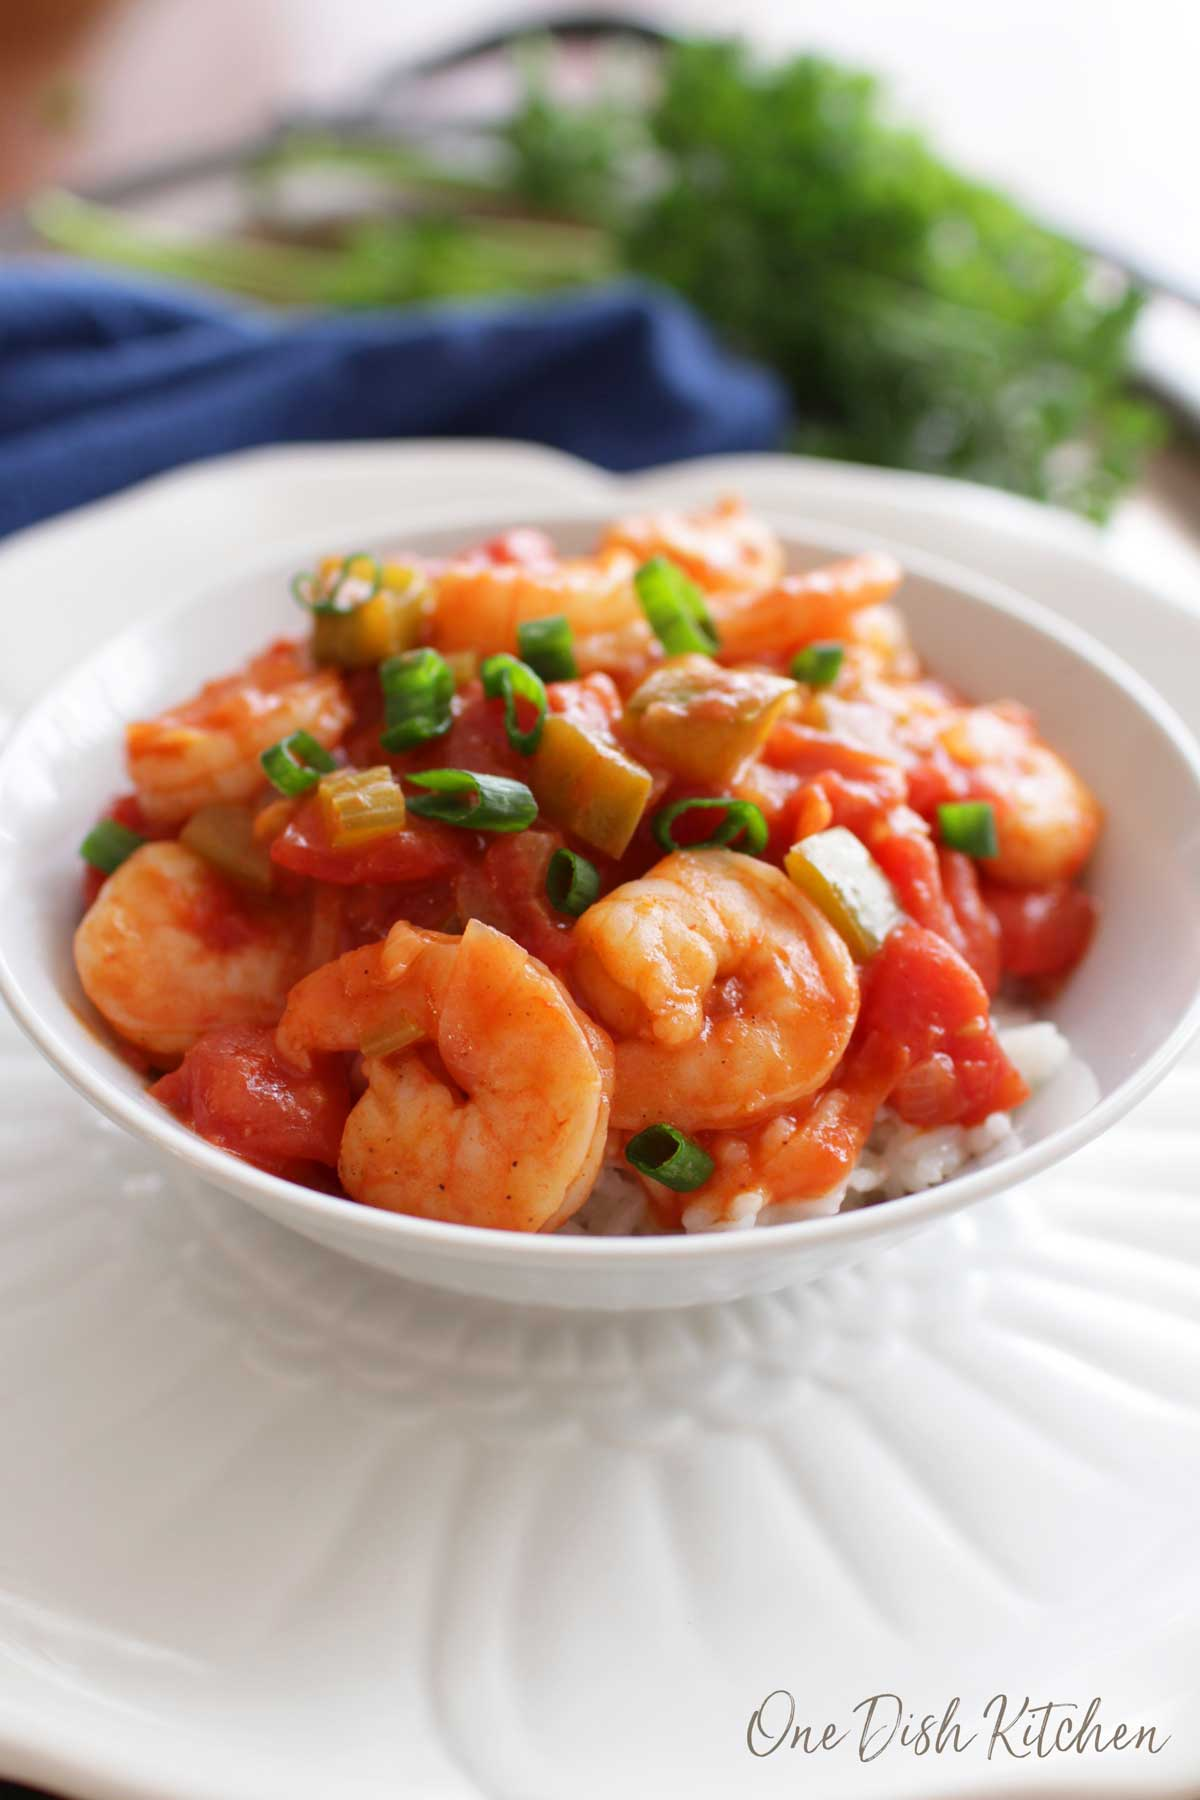 A closeup of a bowl of shrimp creole over white rice